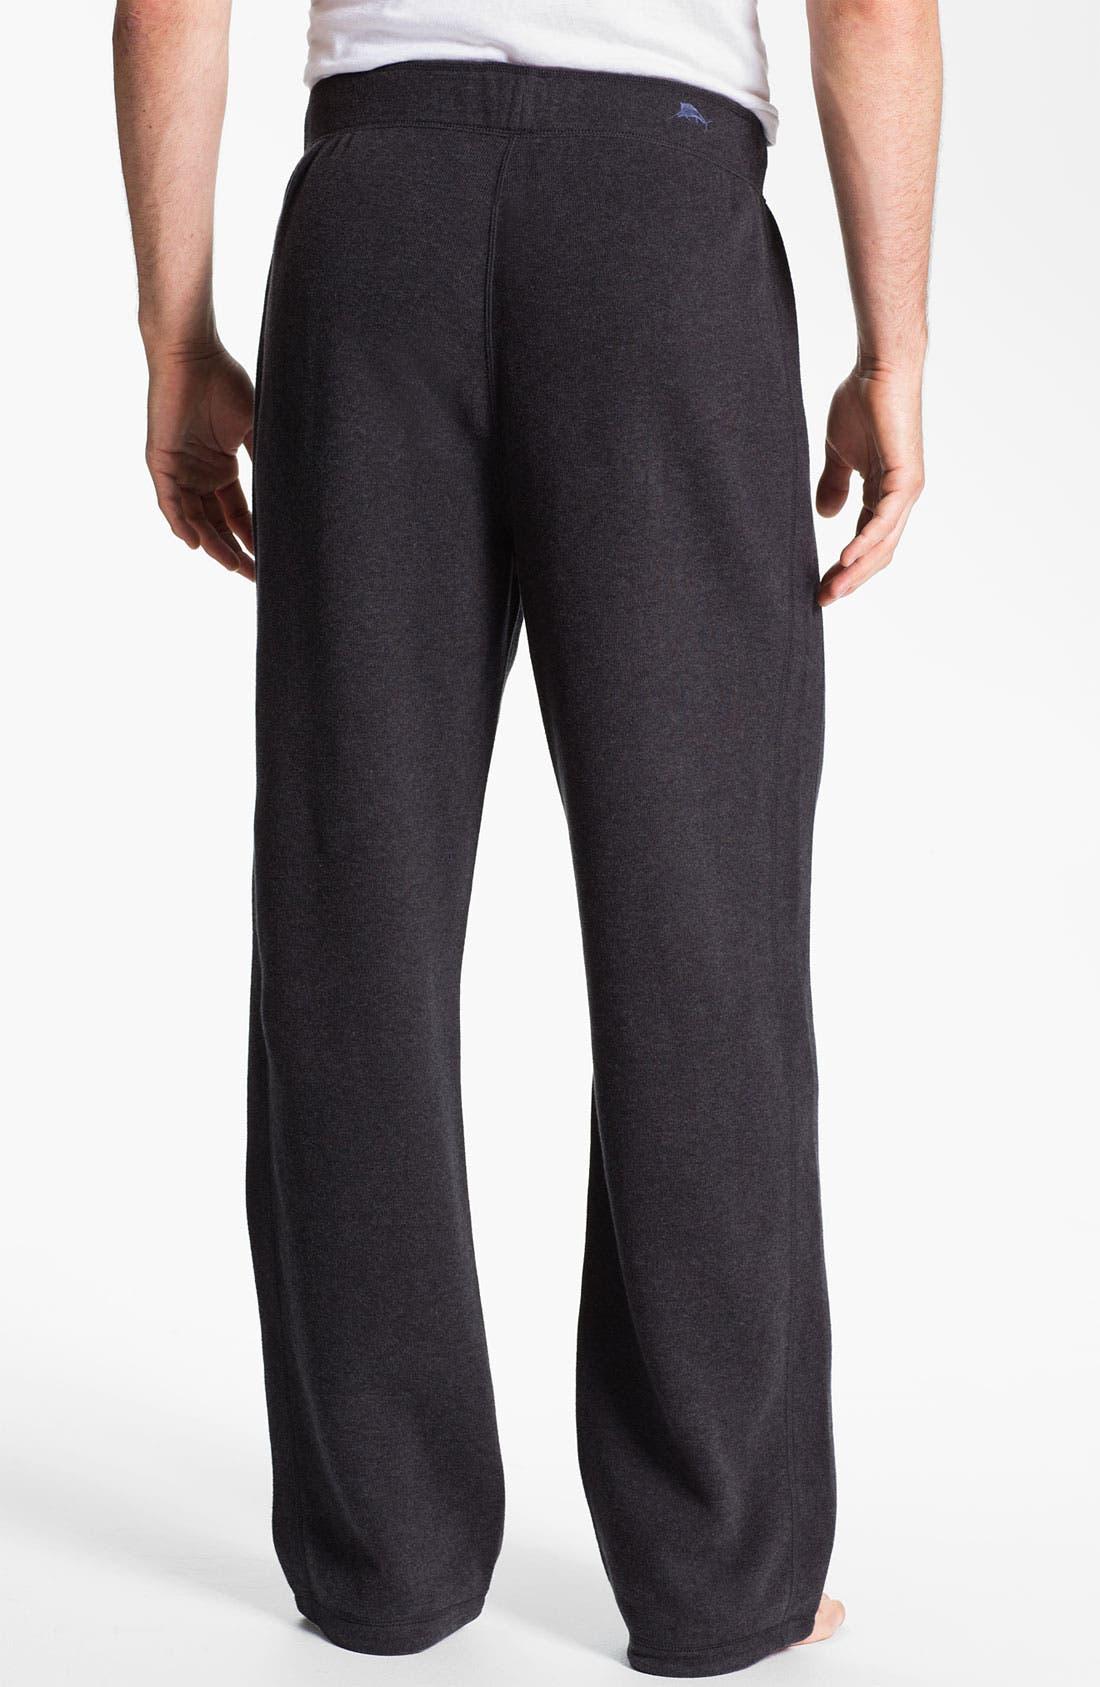 Alternate Image 2  - Tommy Bahama 'Flipside Pro' Reversible Knit Pants